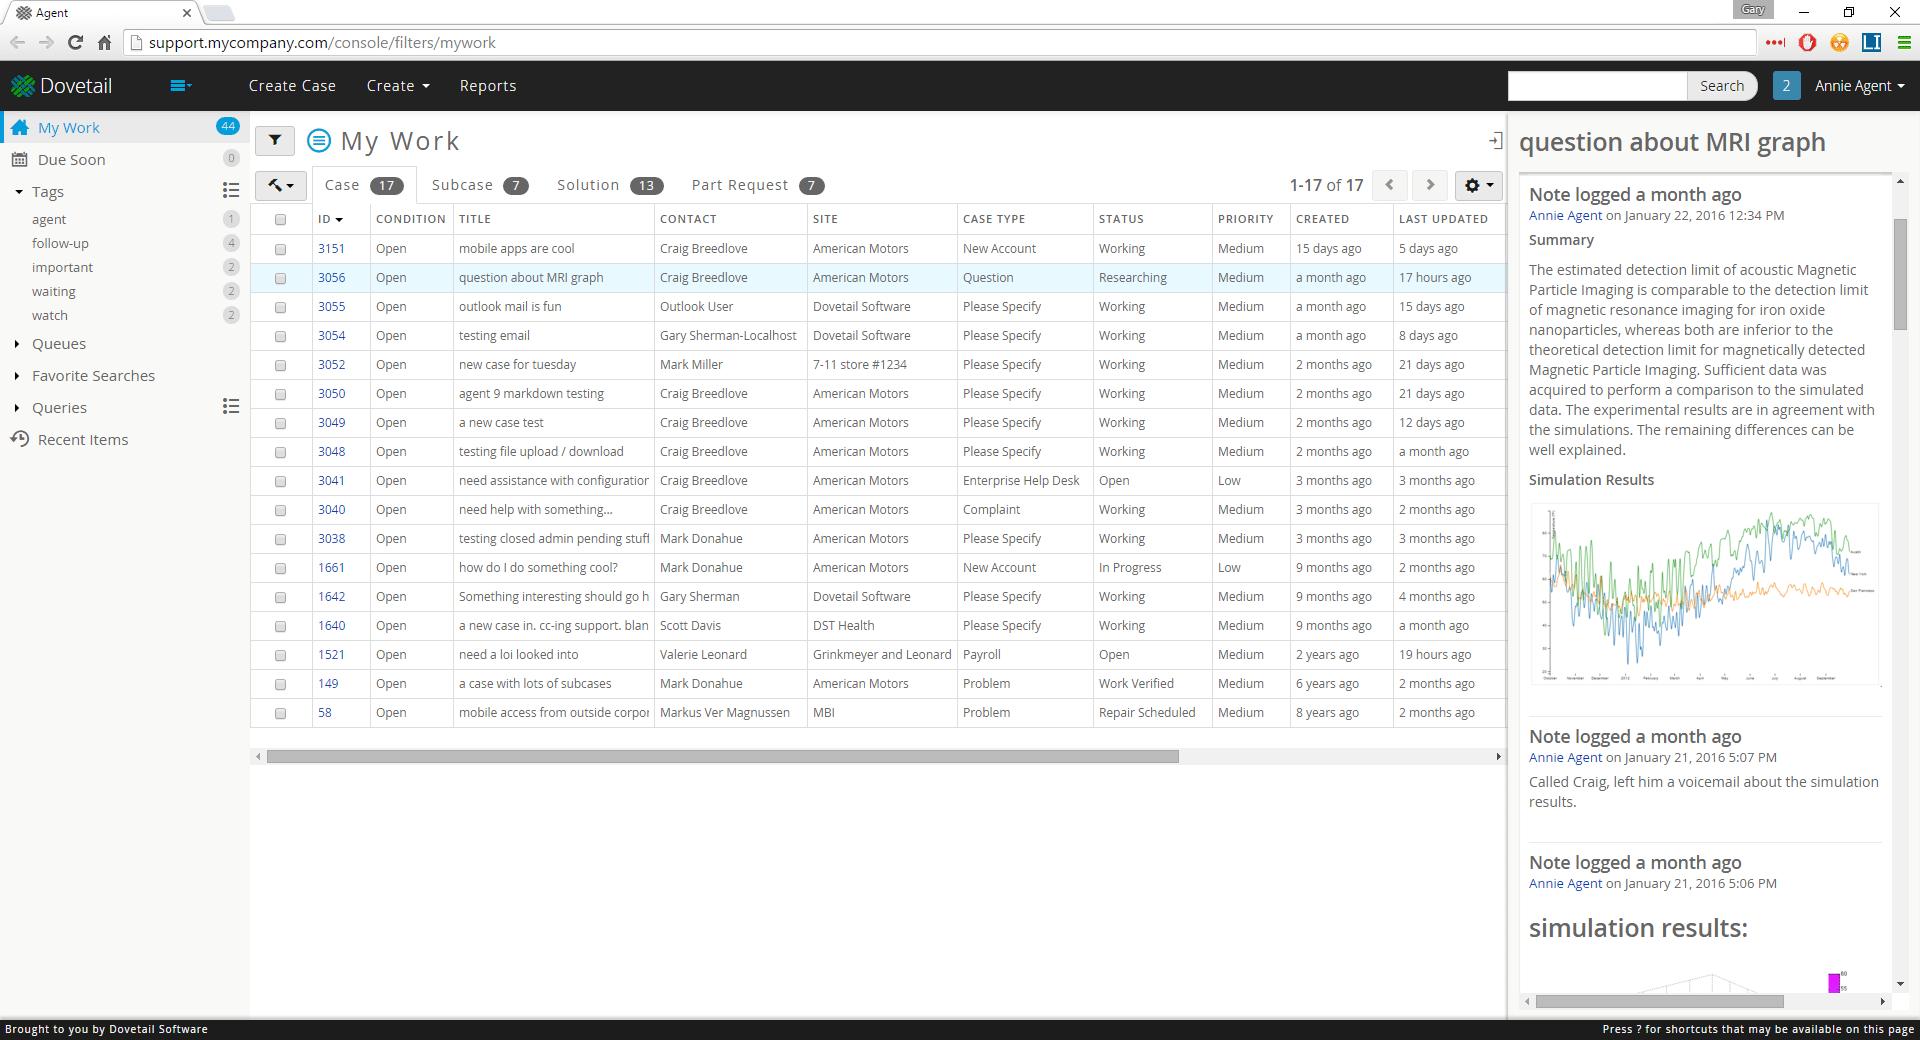 Dovetail Agent, Clarify help desk, Clarify CRM, Amdocs Clarify